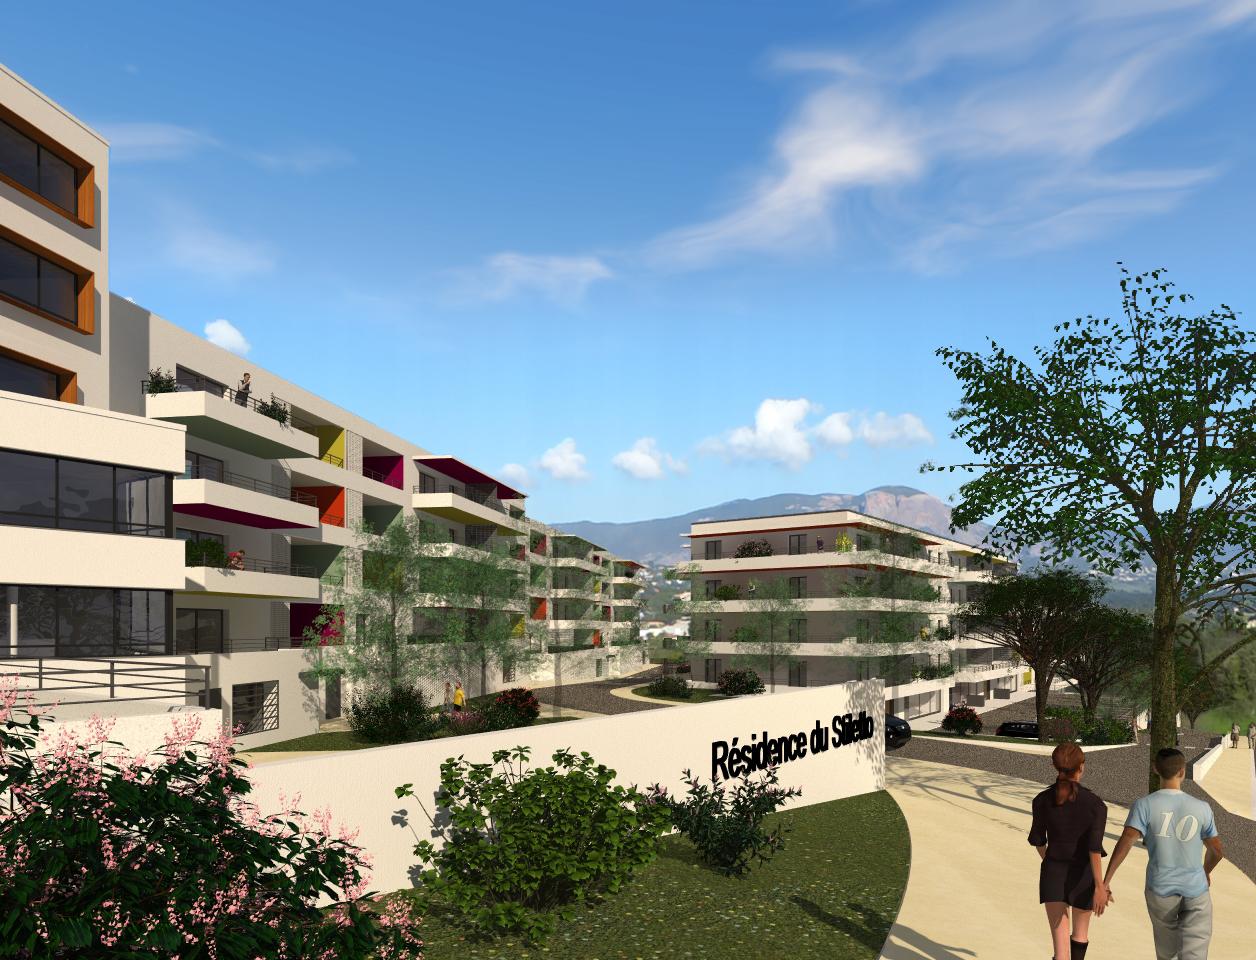 Residence du stiletto programme neuf ajaccio stiletto for Residence immobilier